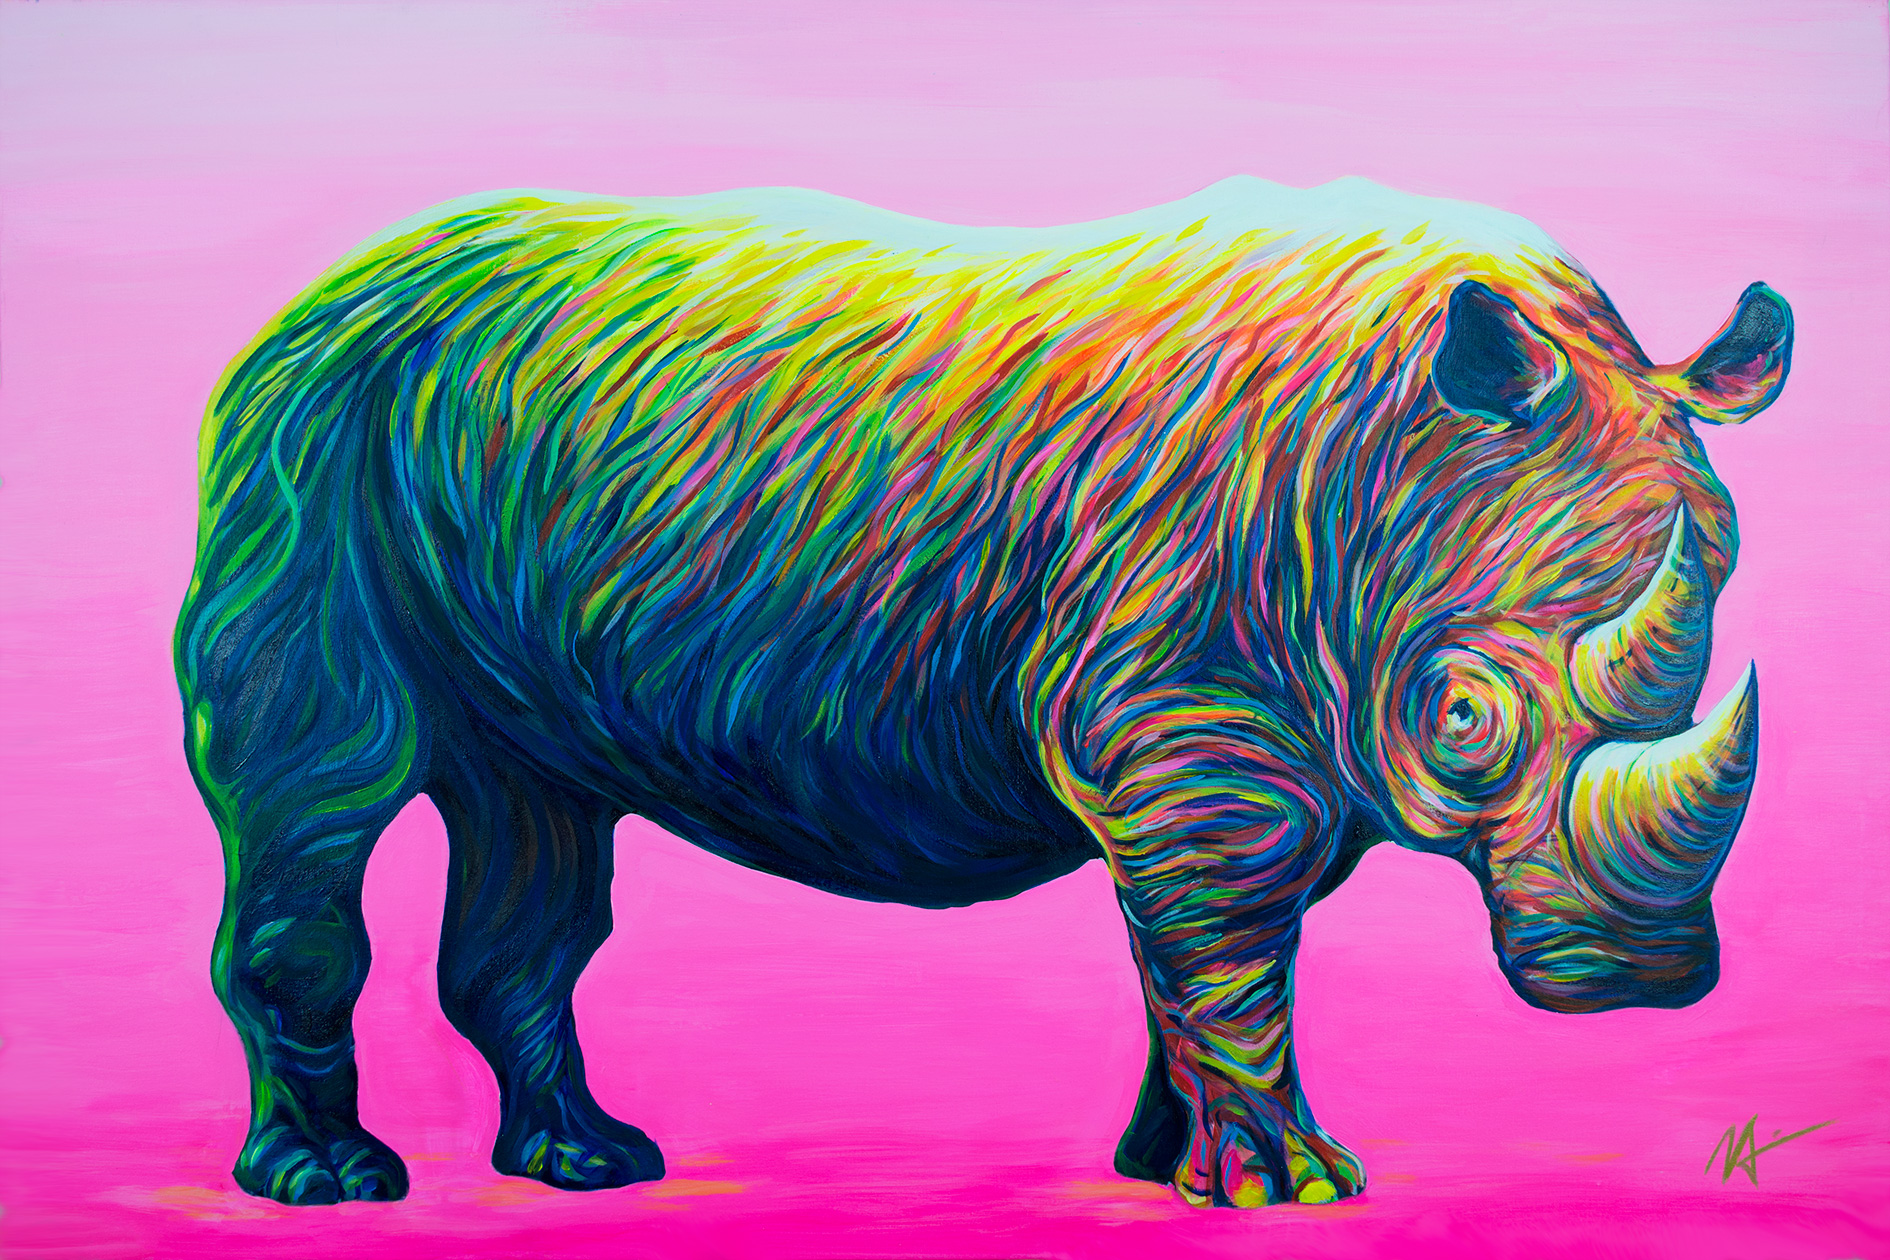 'Rhino' (2015) - Sold